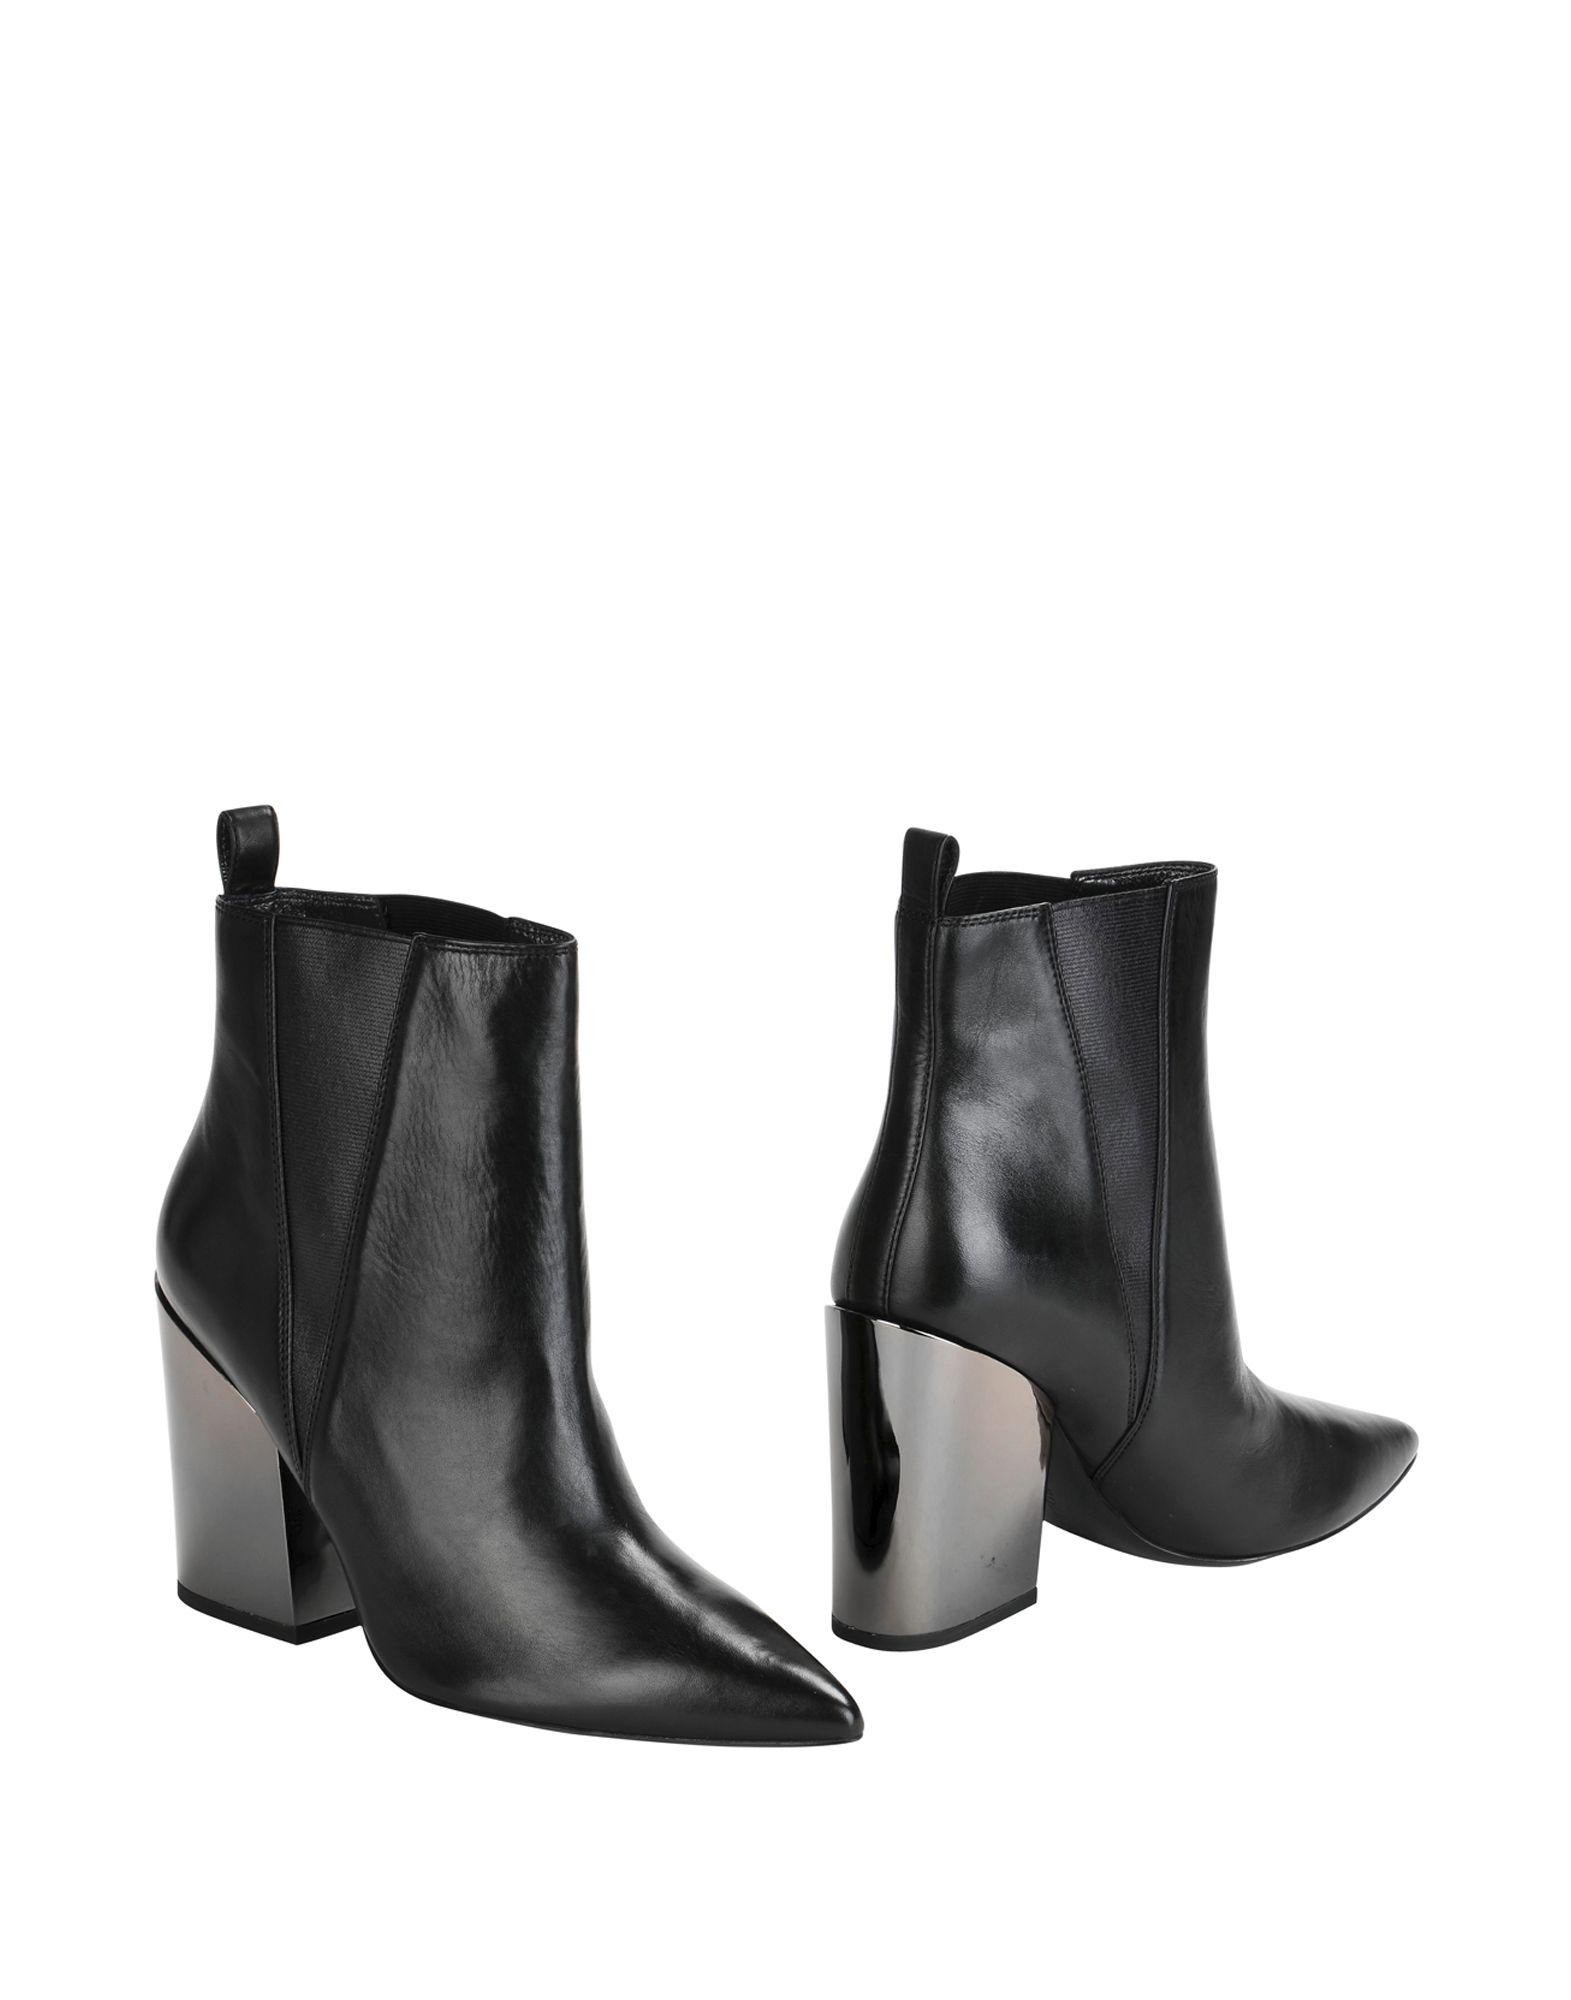 Carlo Pazolini Stiefelette Damen  11337302TH Gute Qualität beliebte Schuhe